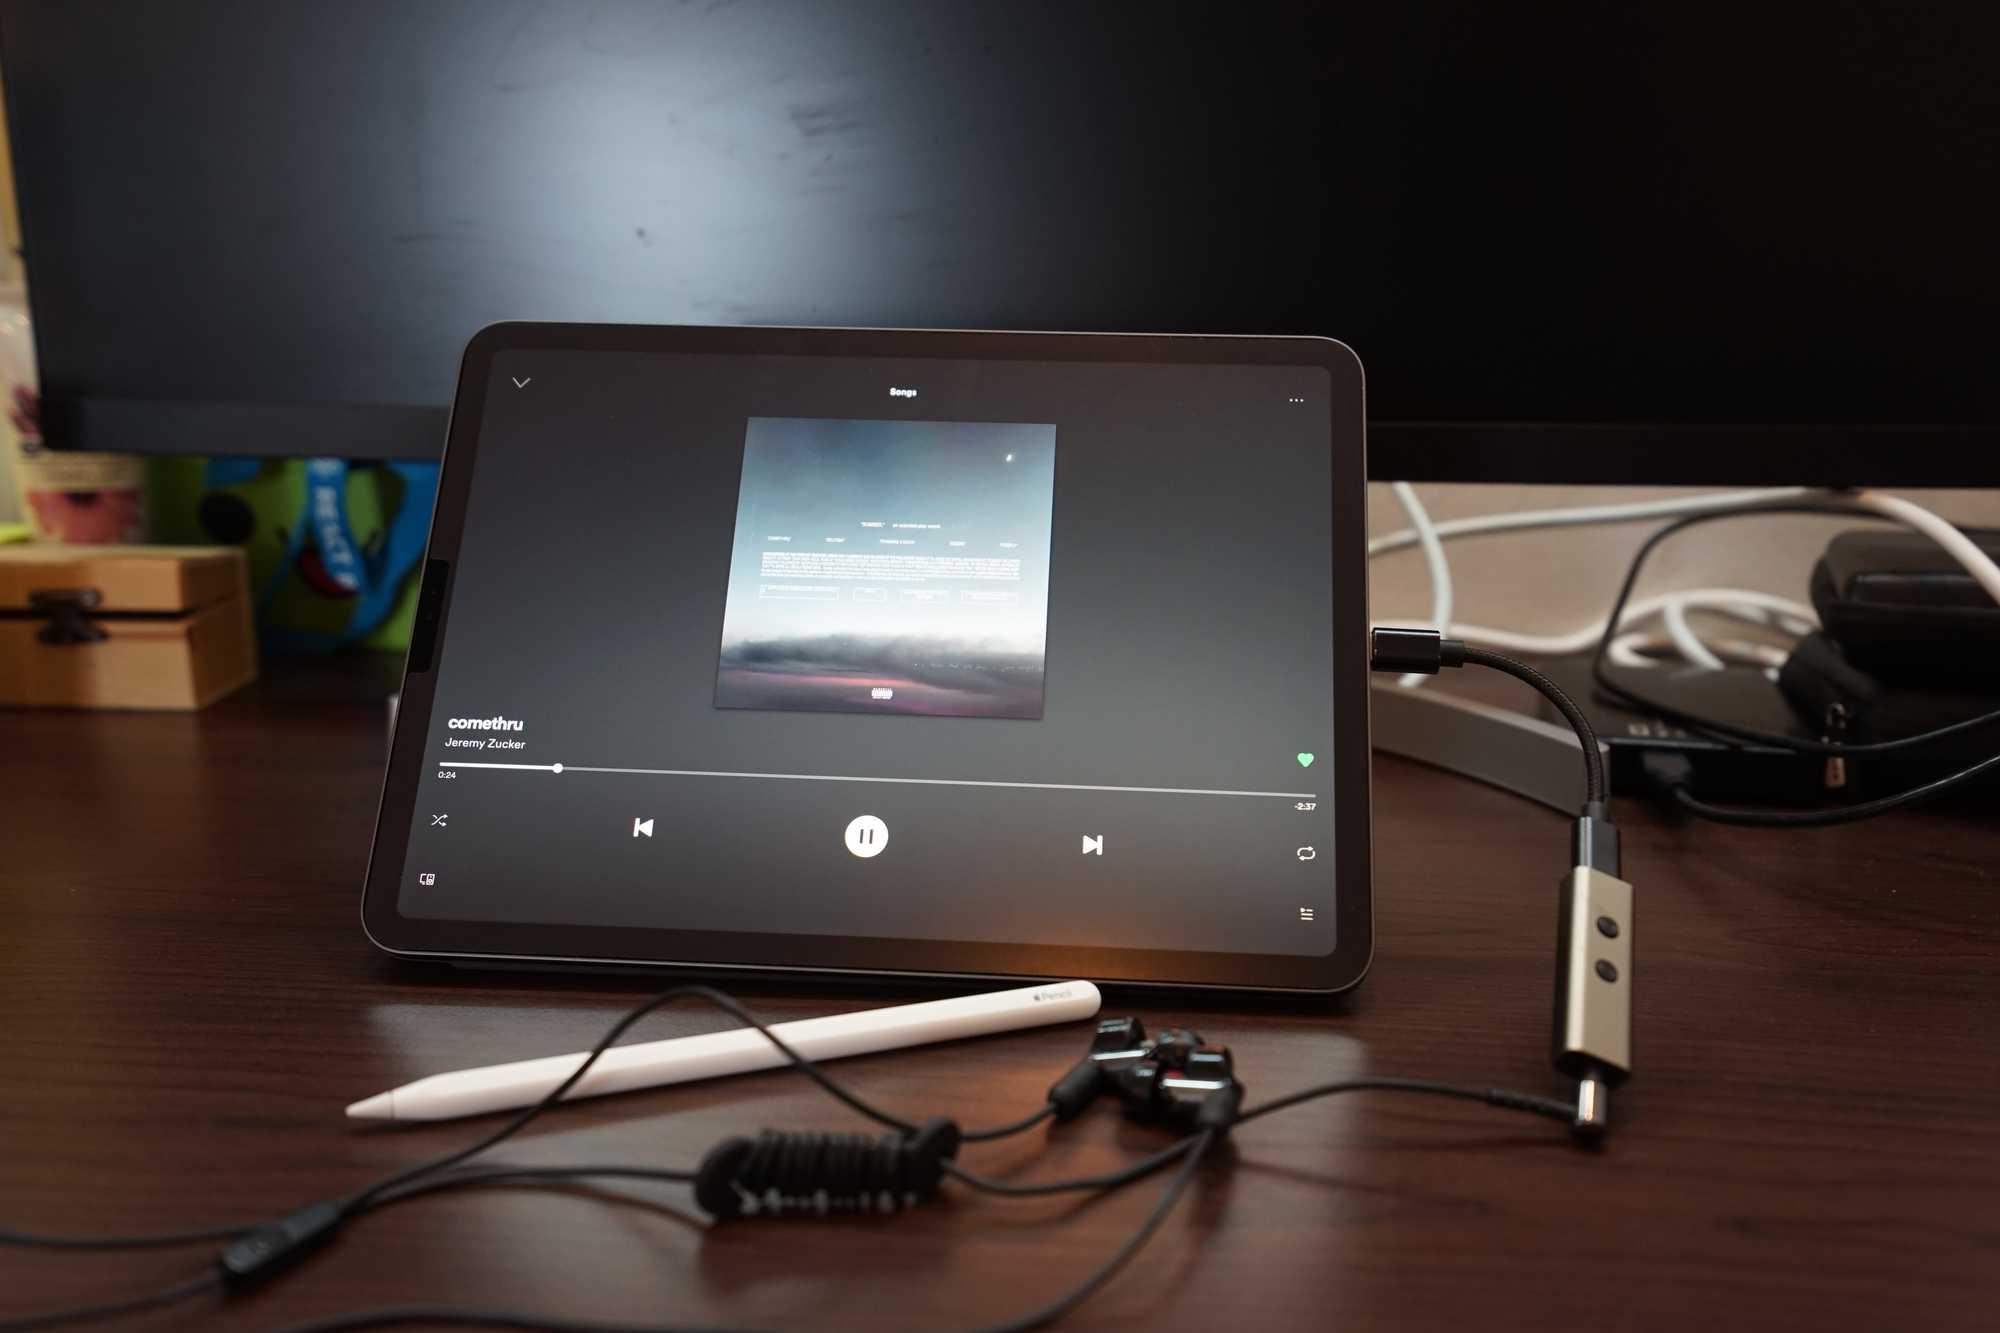 iPad Pro 11-inch with Zuper-DAC